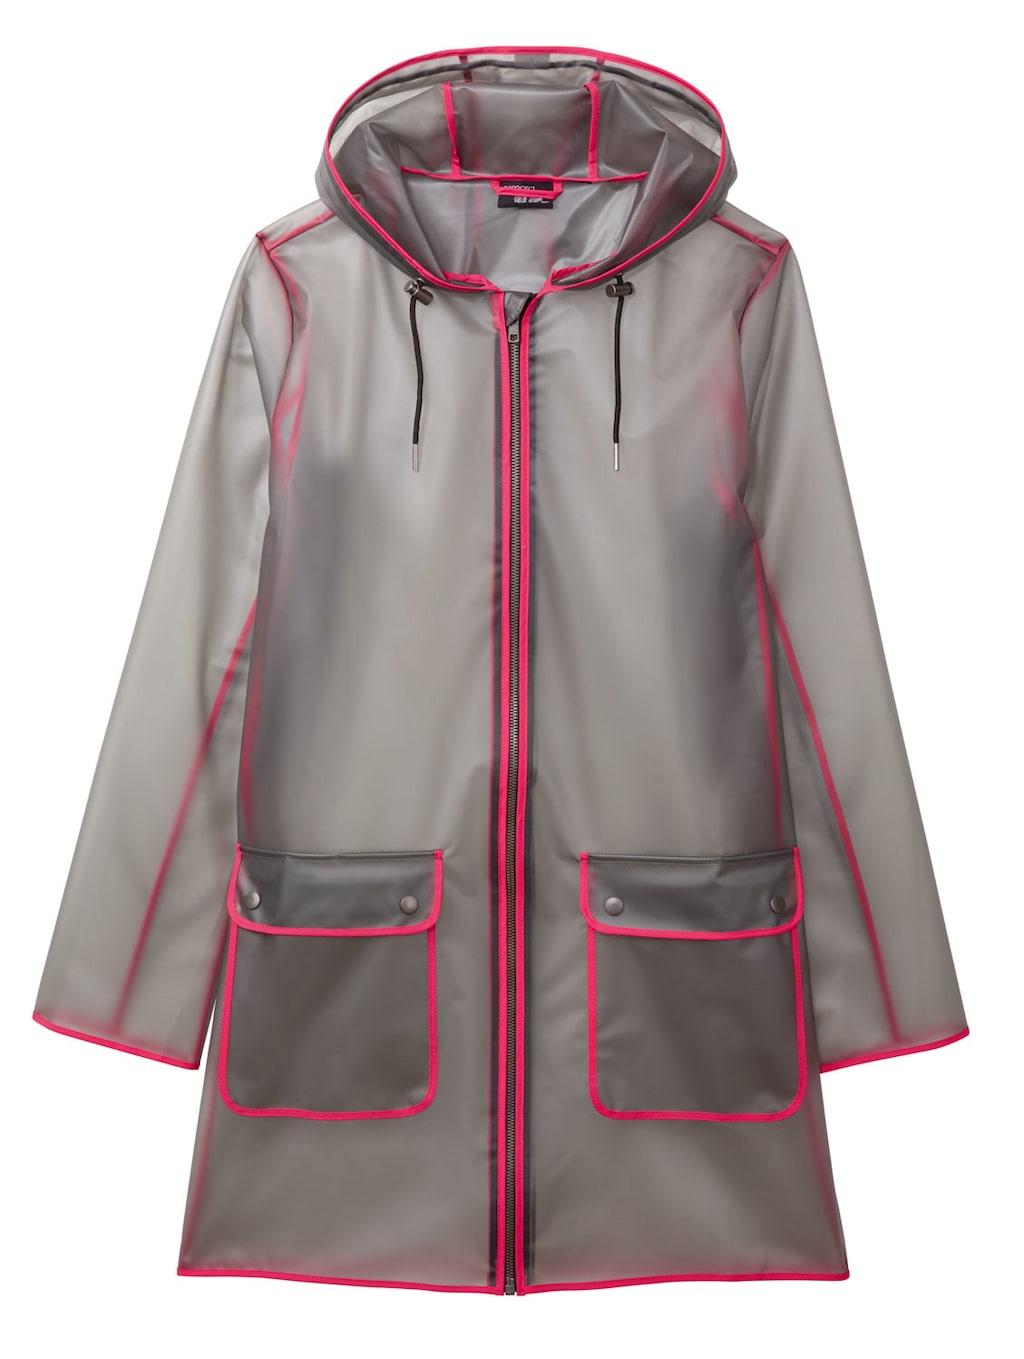 Transparent regnjacka med rosa detaljer.